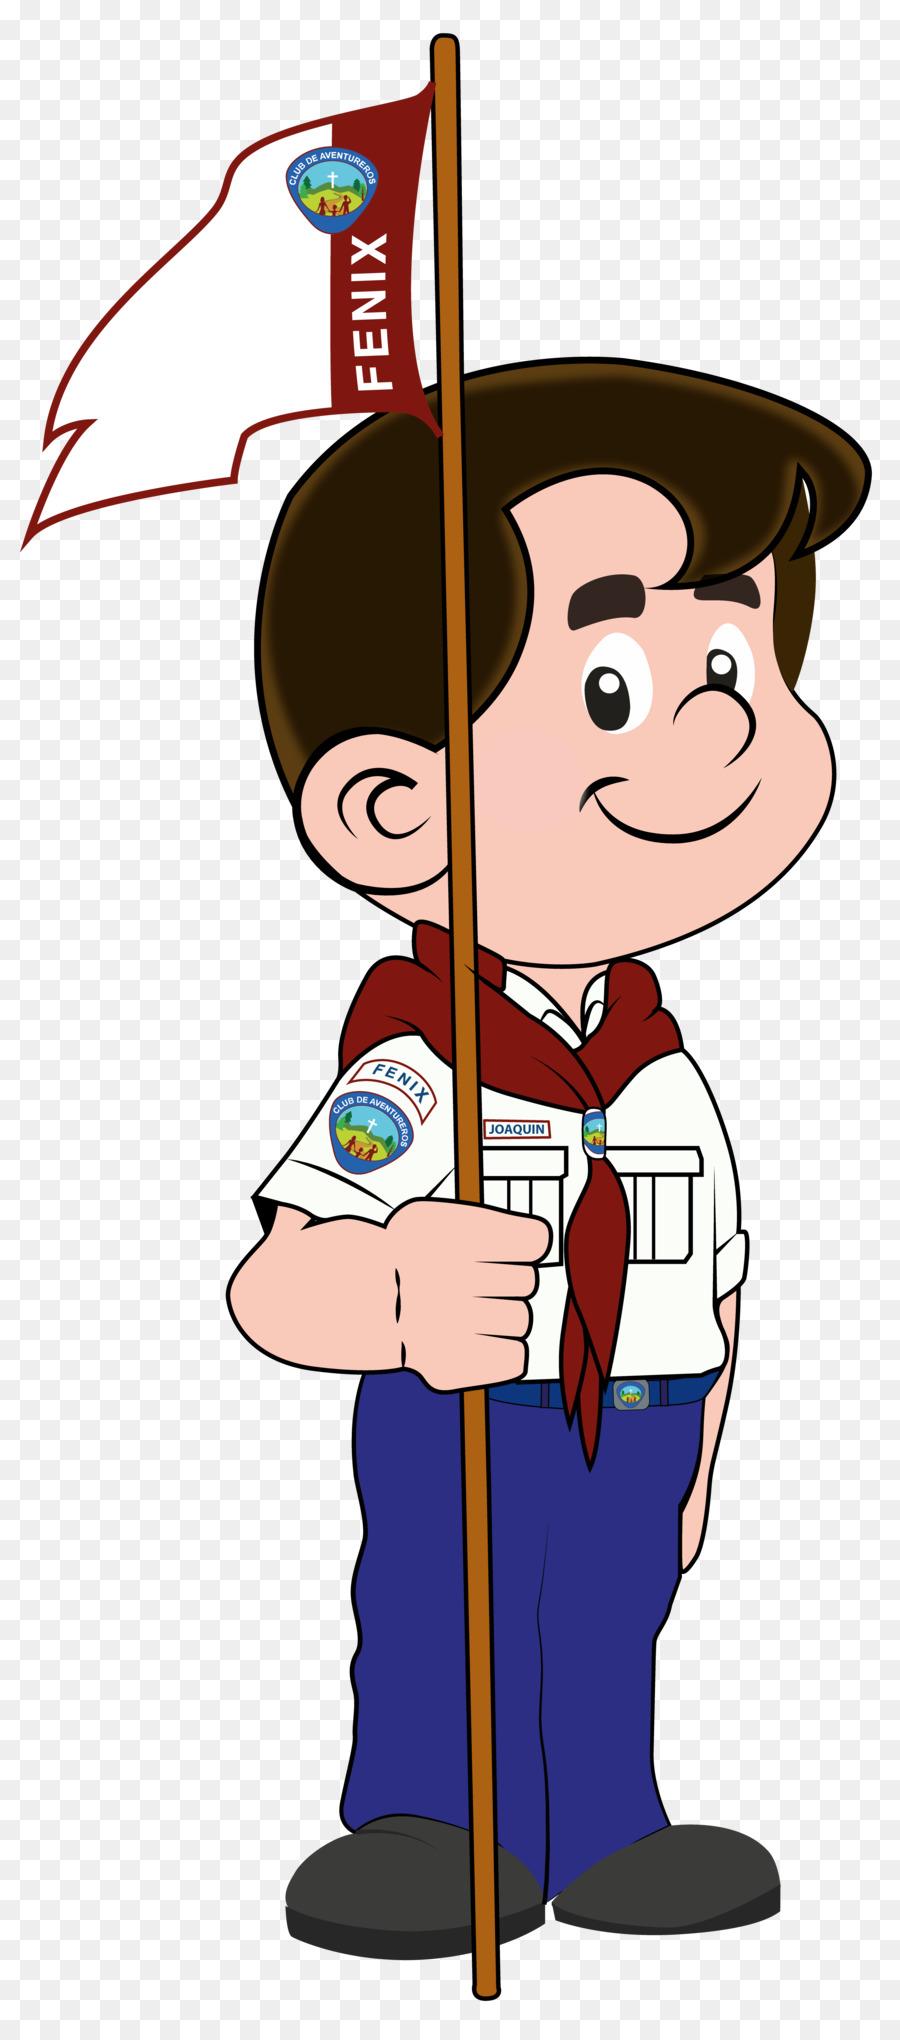 Adventurers clipart banner freeuse download Cartoon Cartoon clipart - Cartoon, Illustration, Graphics ... banner freeuse download